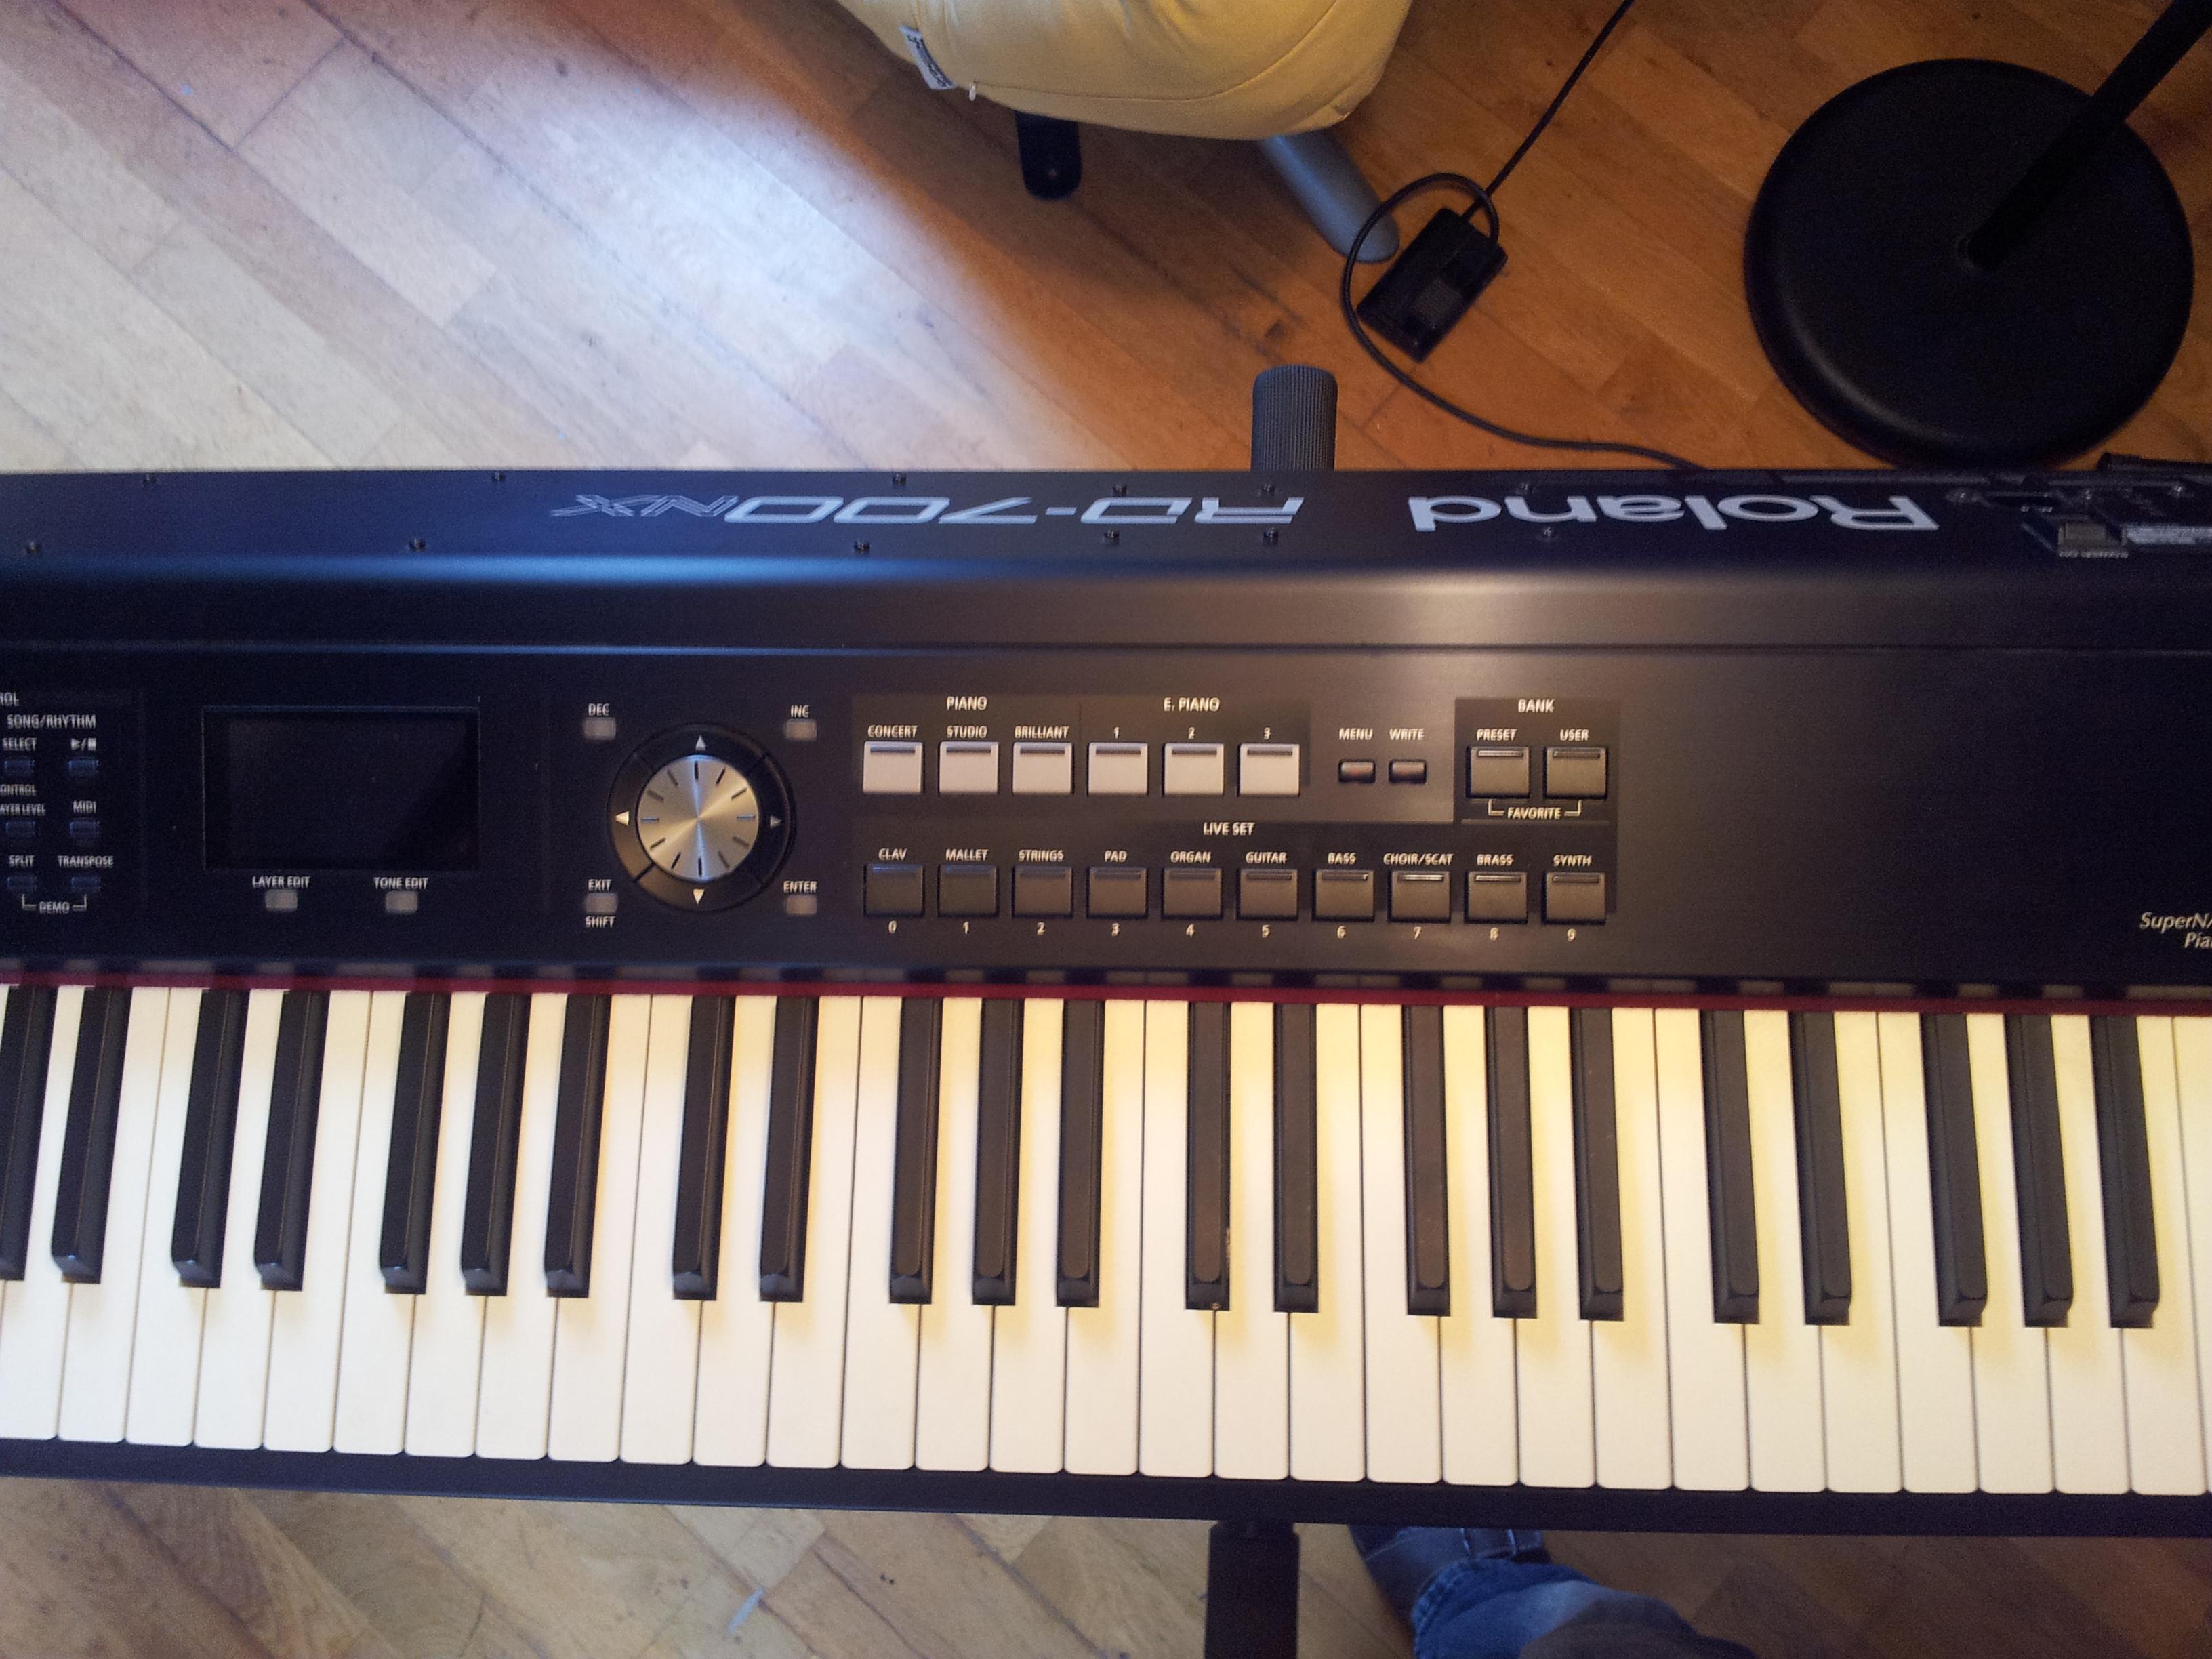 roland rd 700nx image 516700 audiofanzine rh en audiofanzine com Roland RD- 700 roland rd-700nx review keyboard magazine